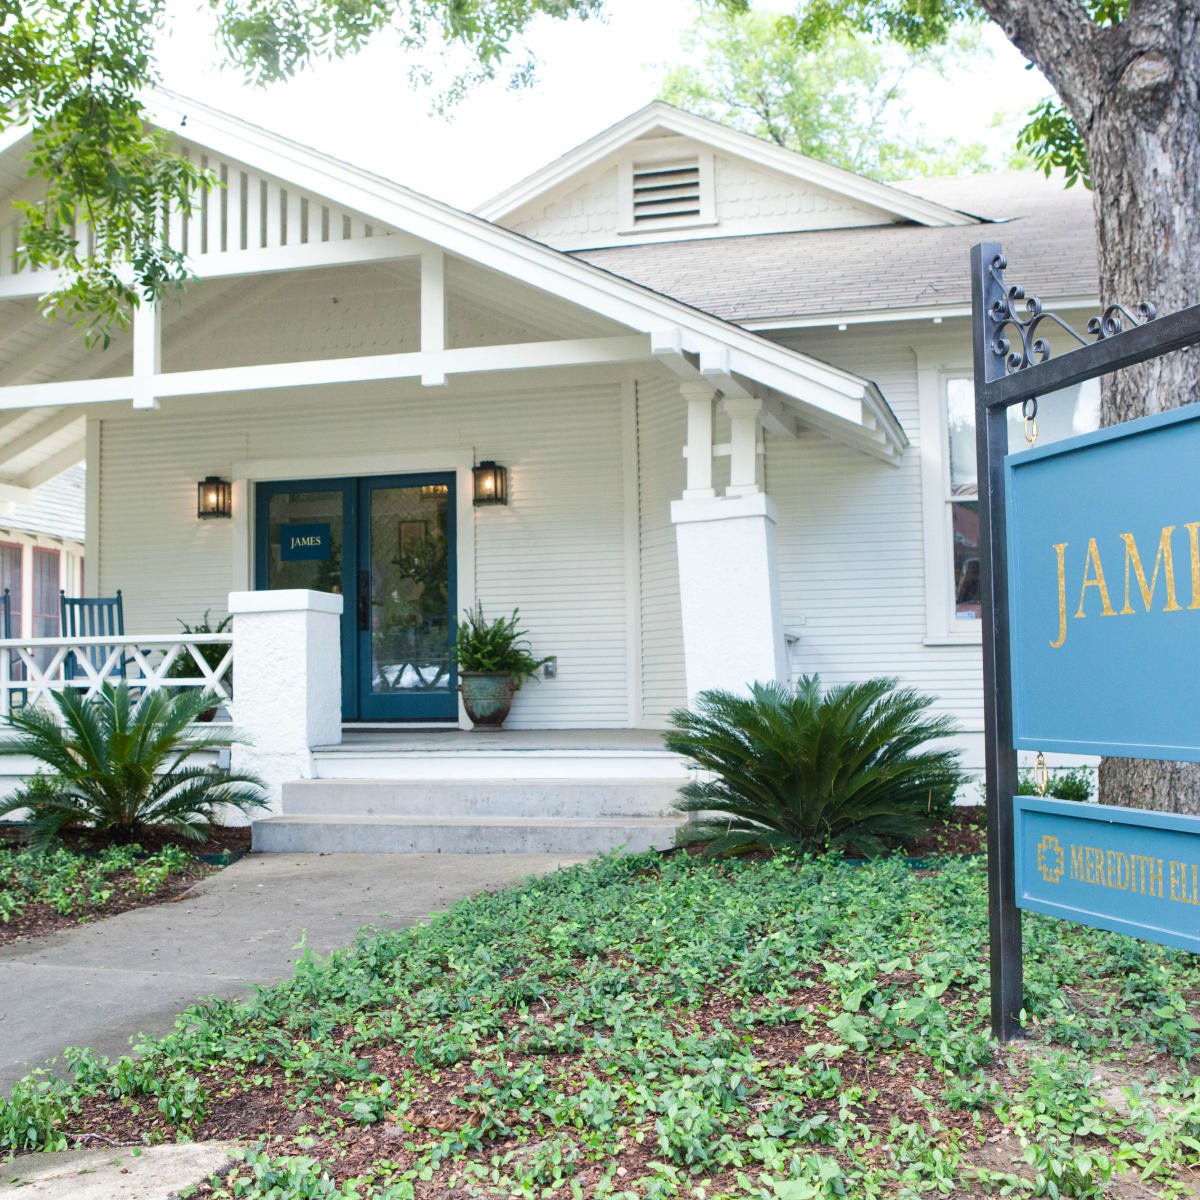 James showroom Austin